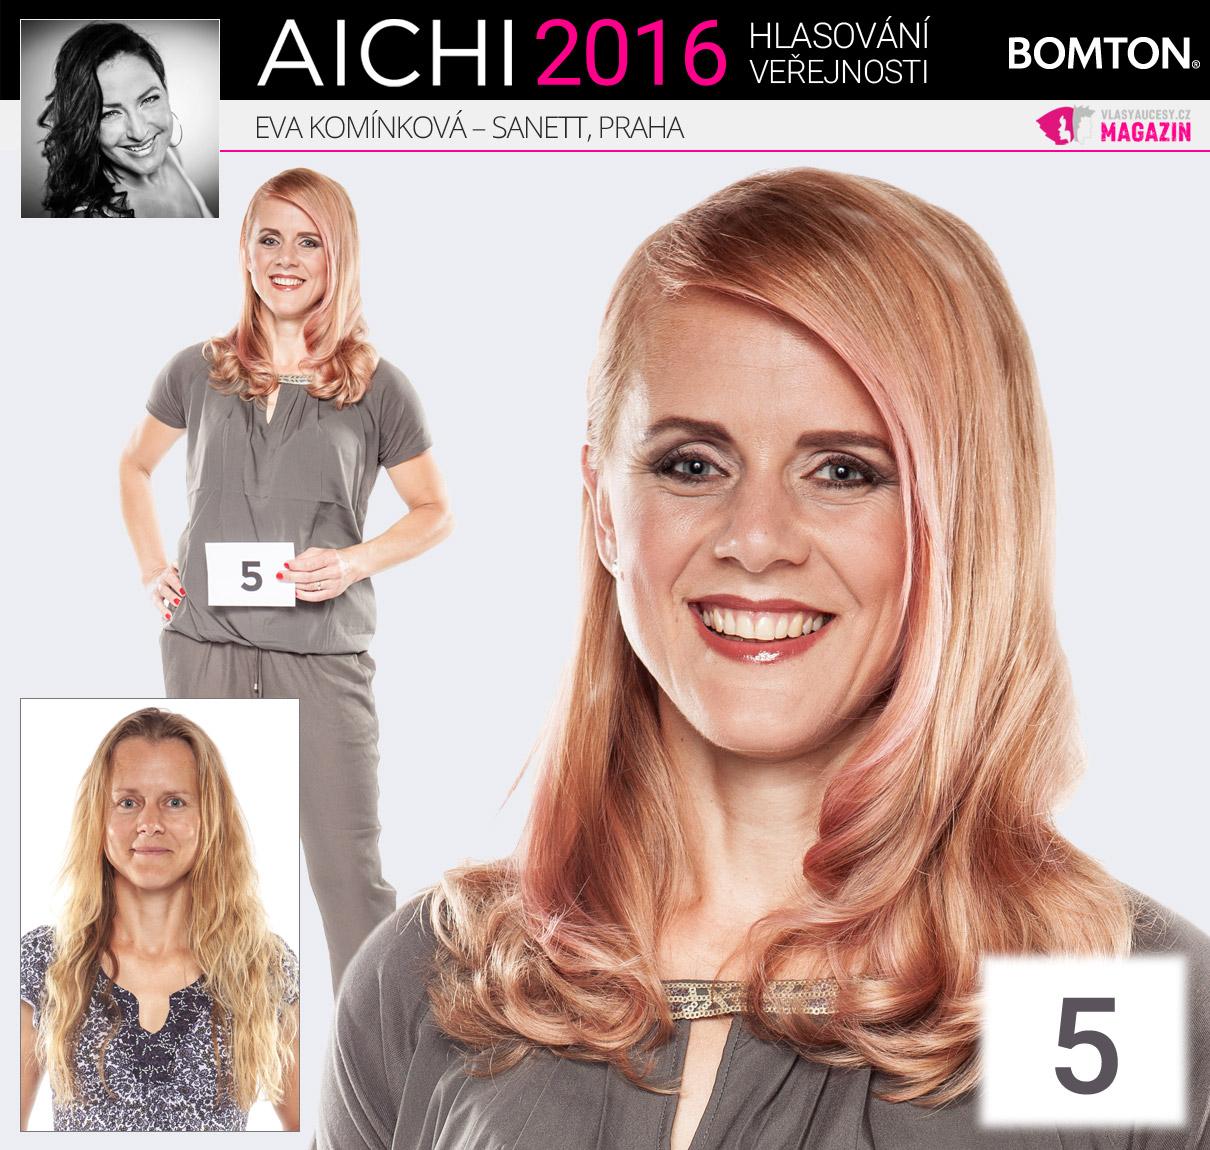 Finálová proměna AICHI 2016: Eva Komínková, Sanett, Praha